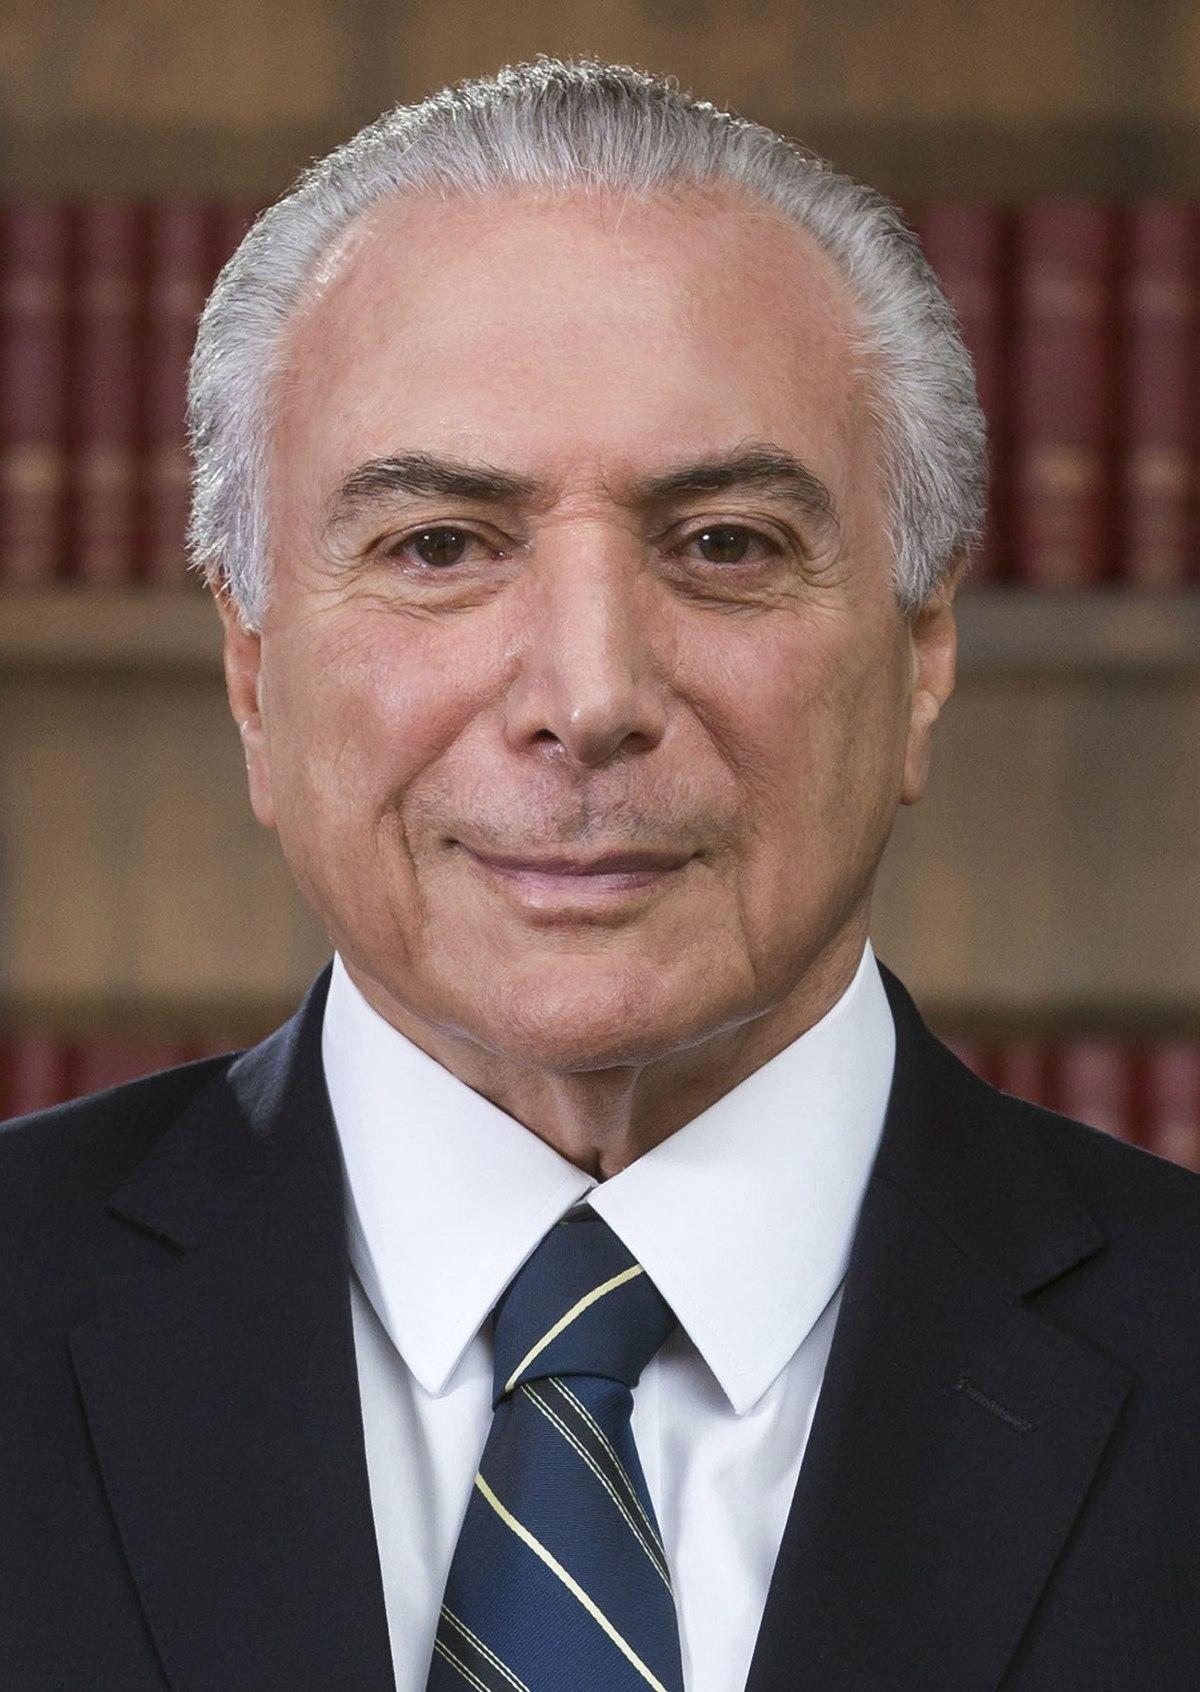 Michel Temer - Wikipedia